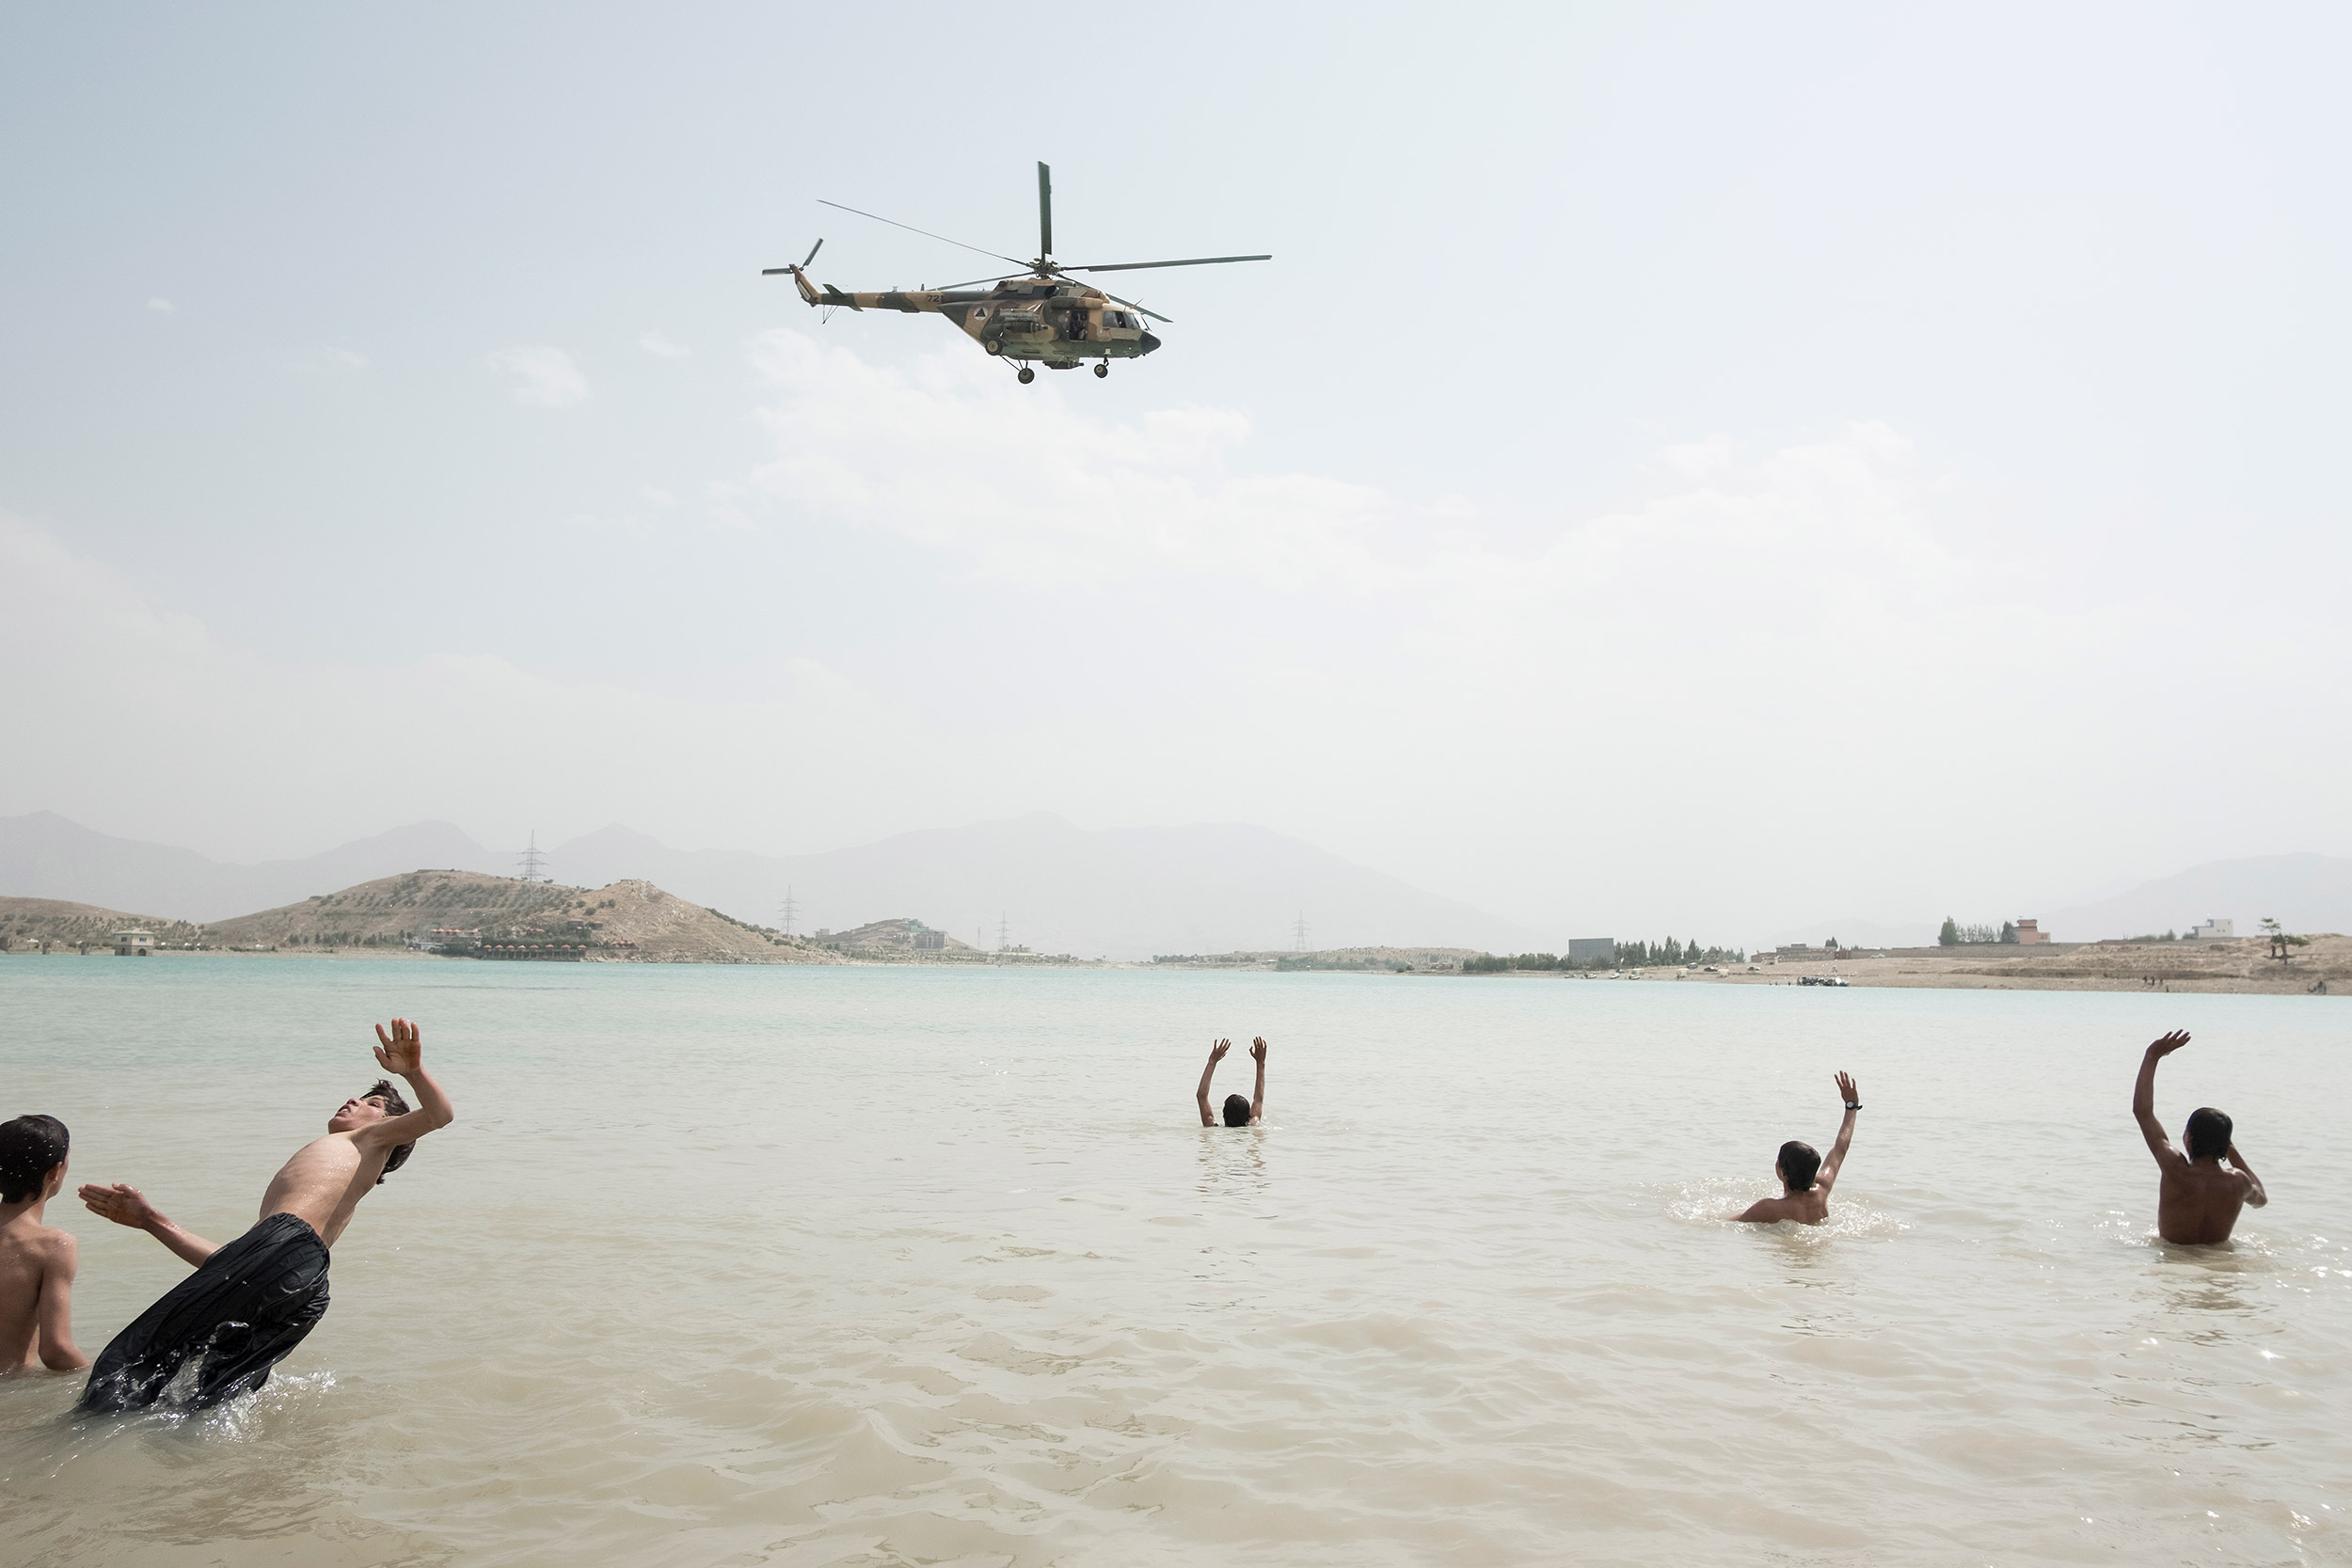 Afghanistan, Kabul, July 29, 2016